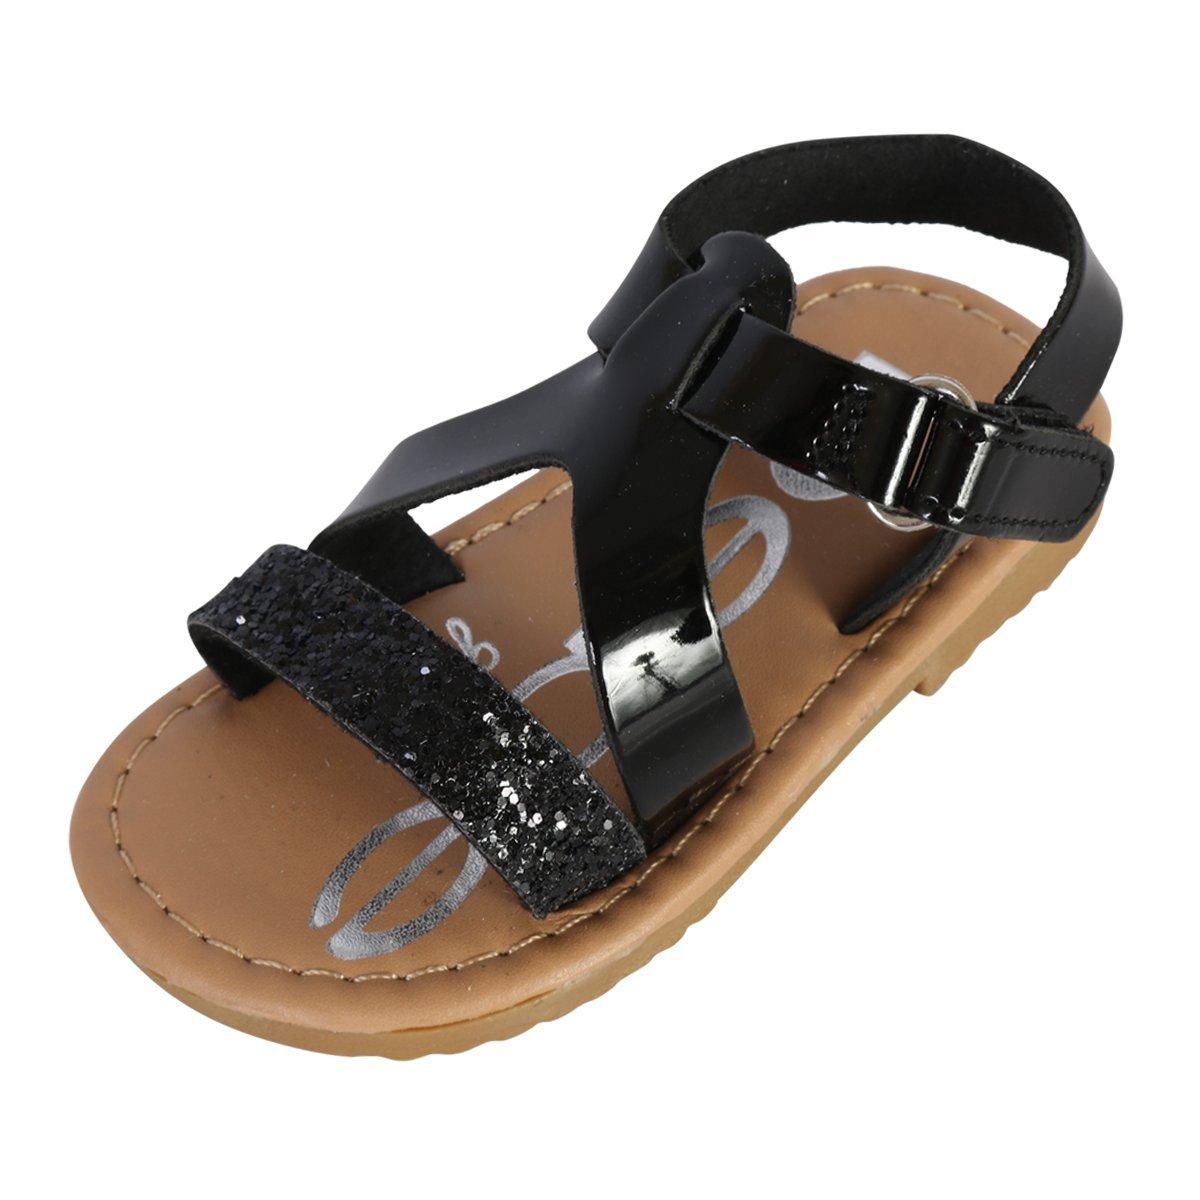 bebe Girls Metallic Glitter Sandals, Black, 8 M US Toddler'